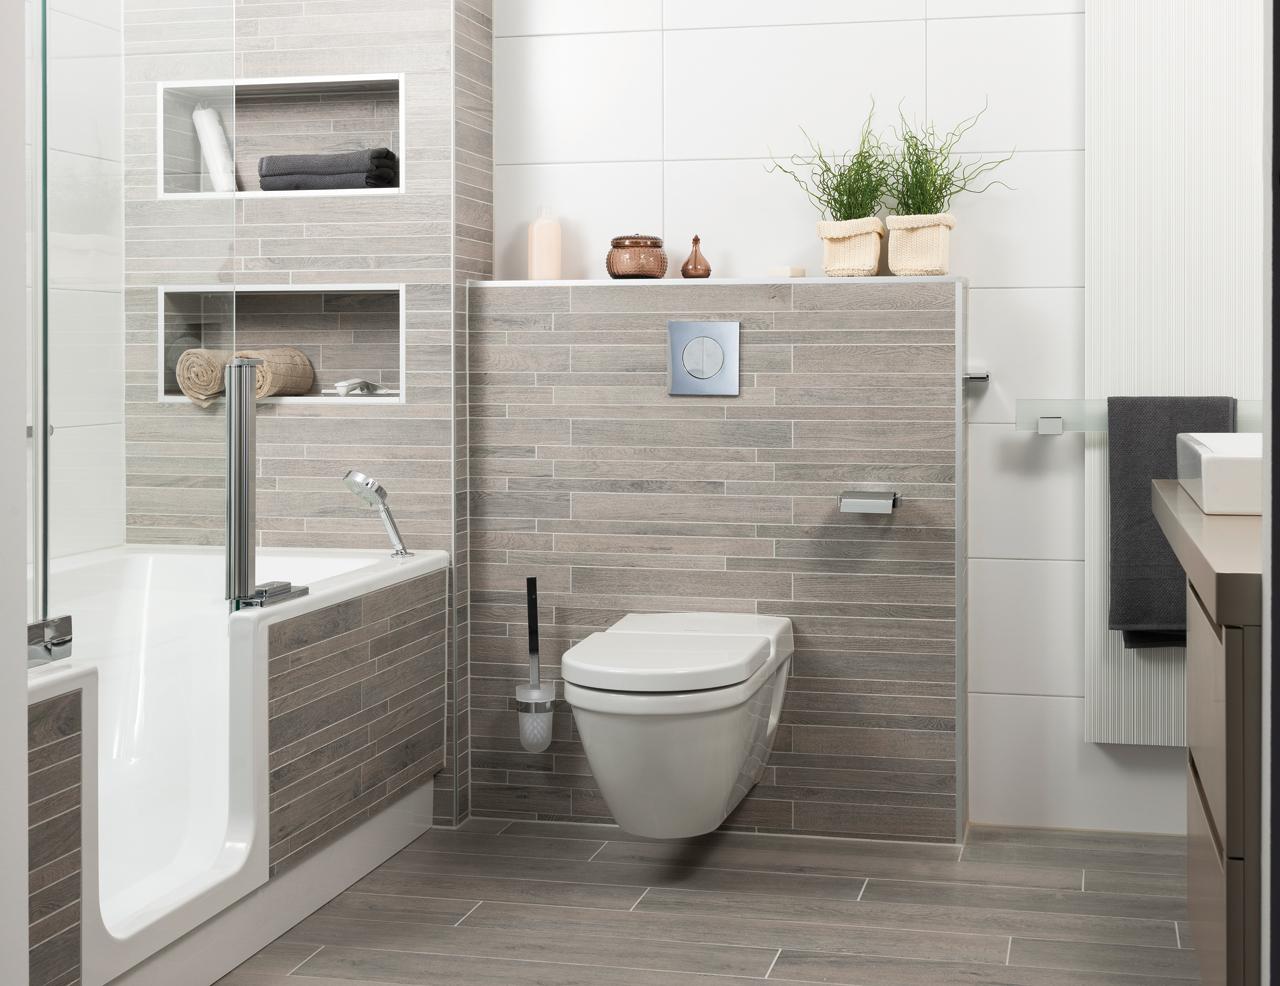 nieuwe badkamer brugman van tot t huis nieuwe badkamer